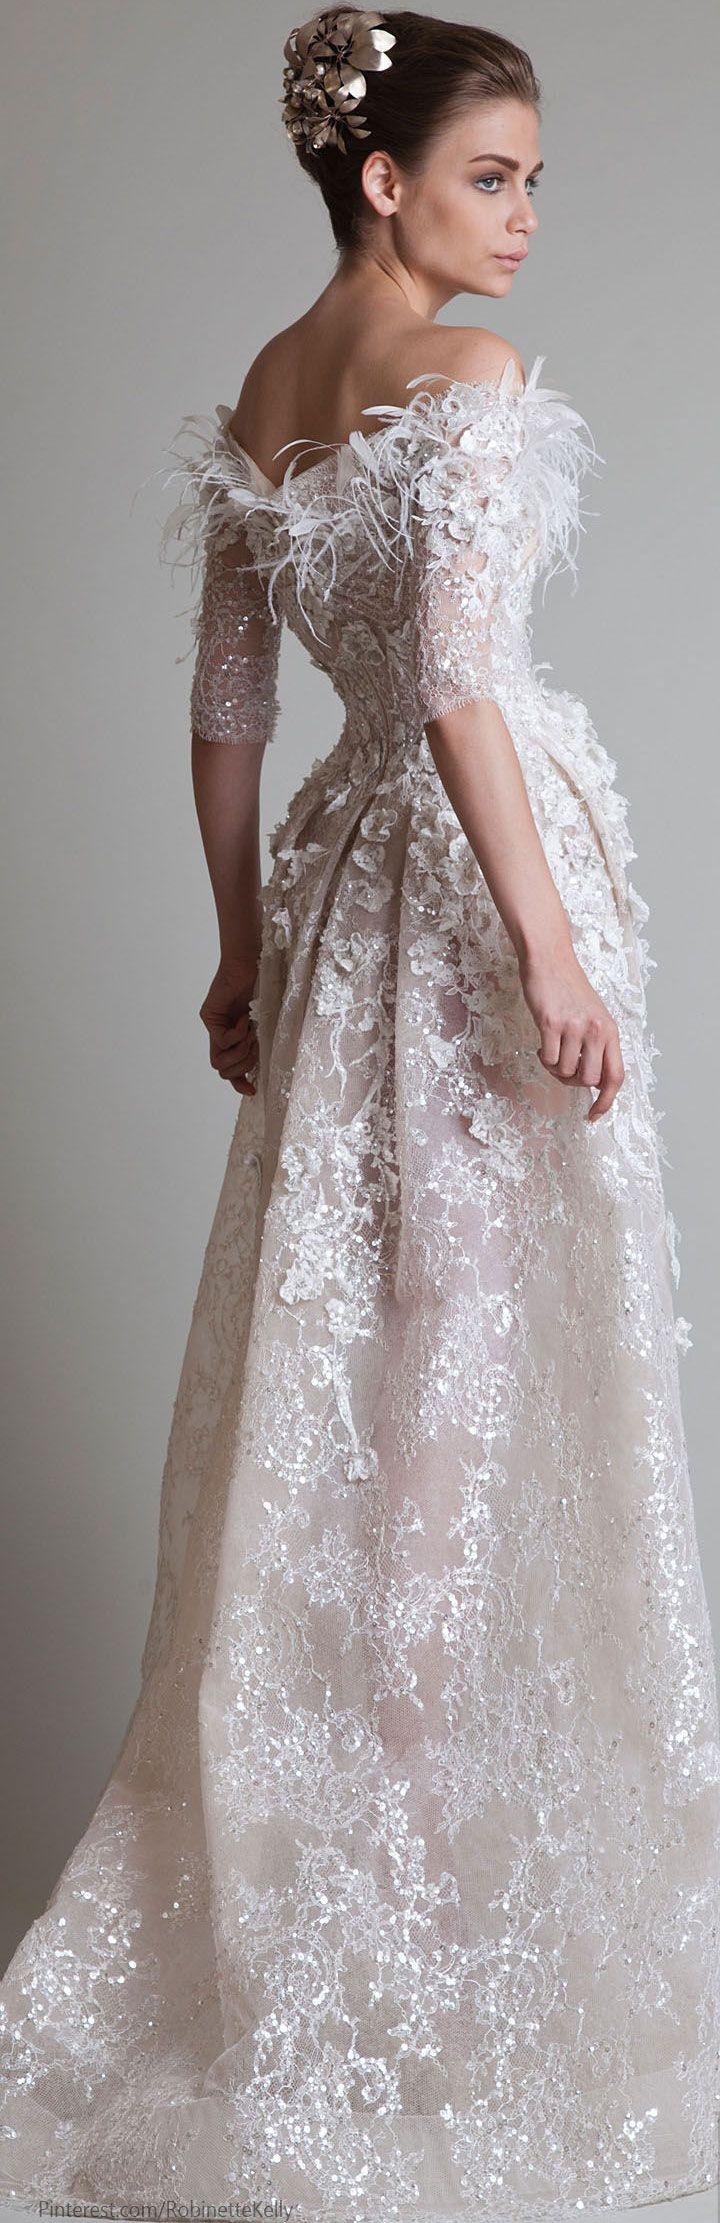 Krikor Jabotian Couture | 2014  ♥✤ | KeepSmiling | BeStayClassy